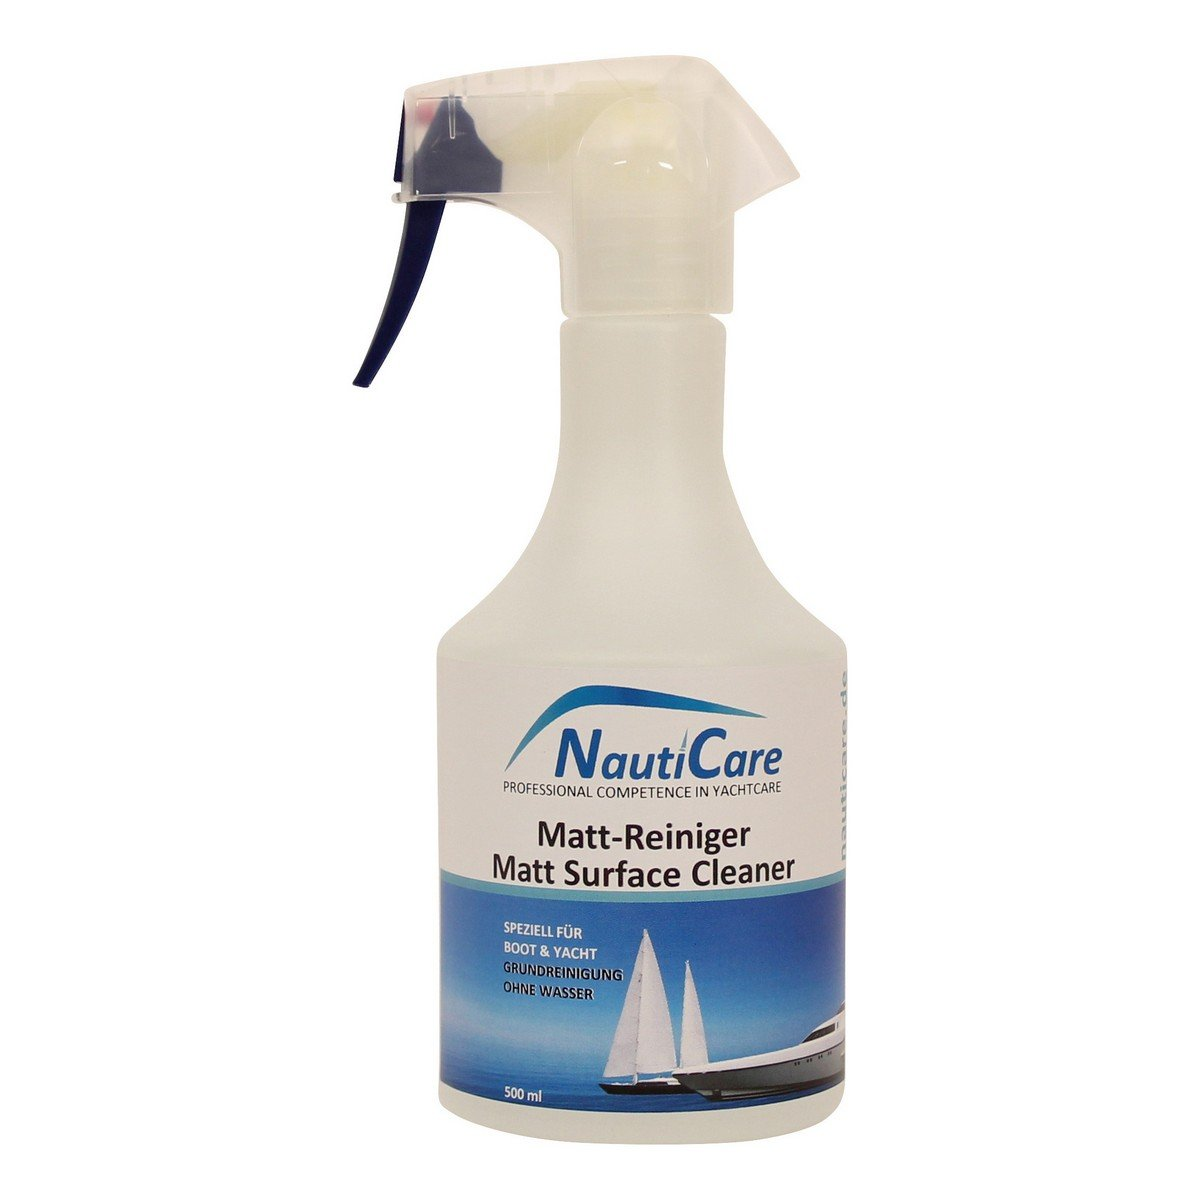 NautiCare Bootsreiniger Innen 500ml Boot Yacht